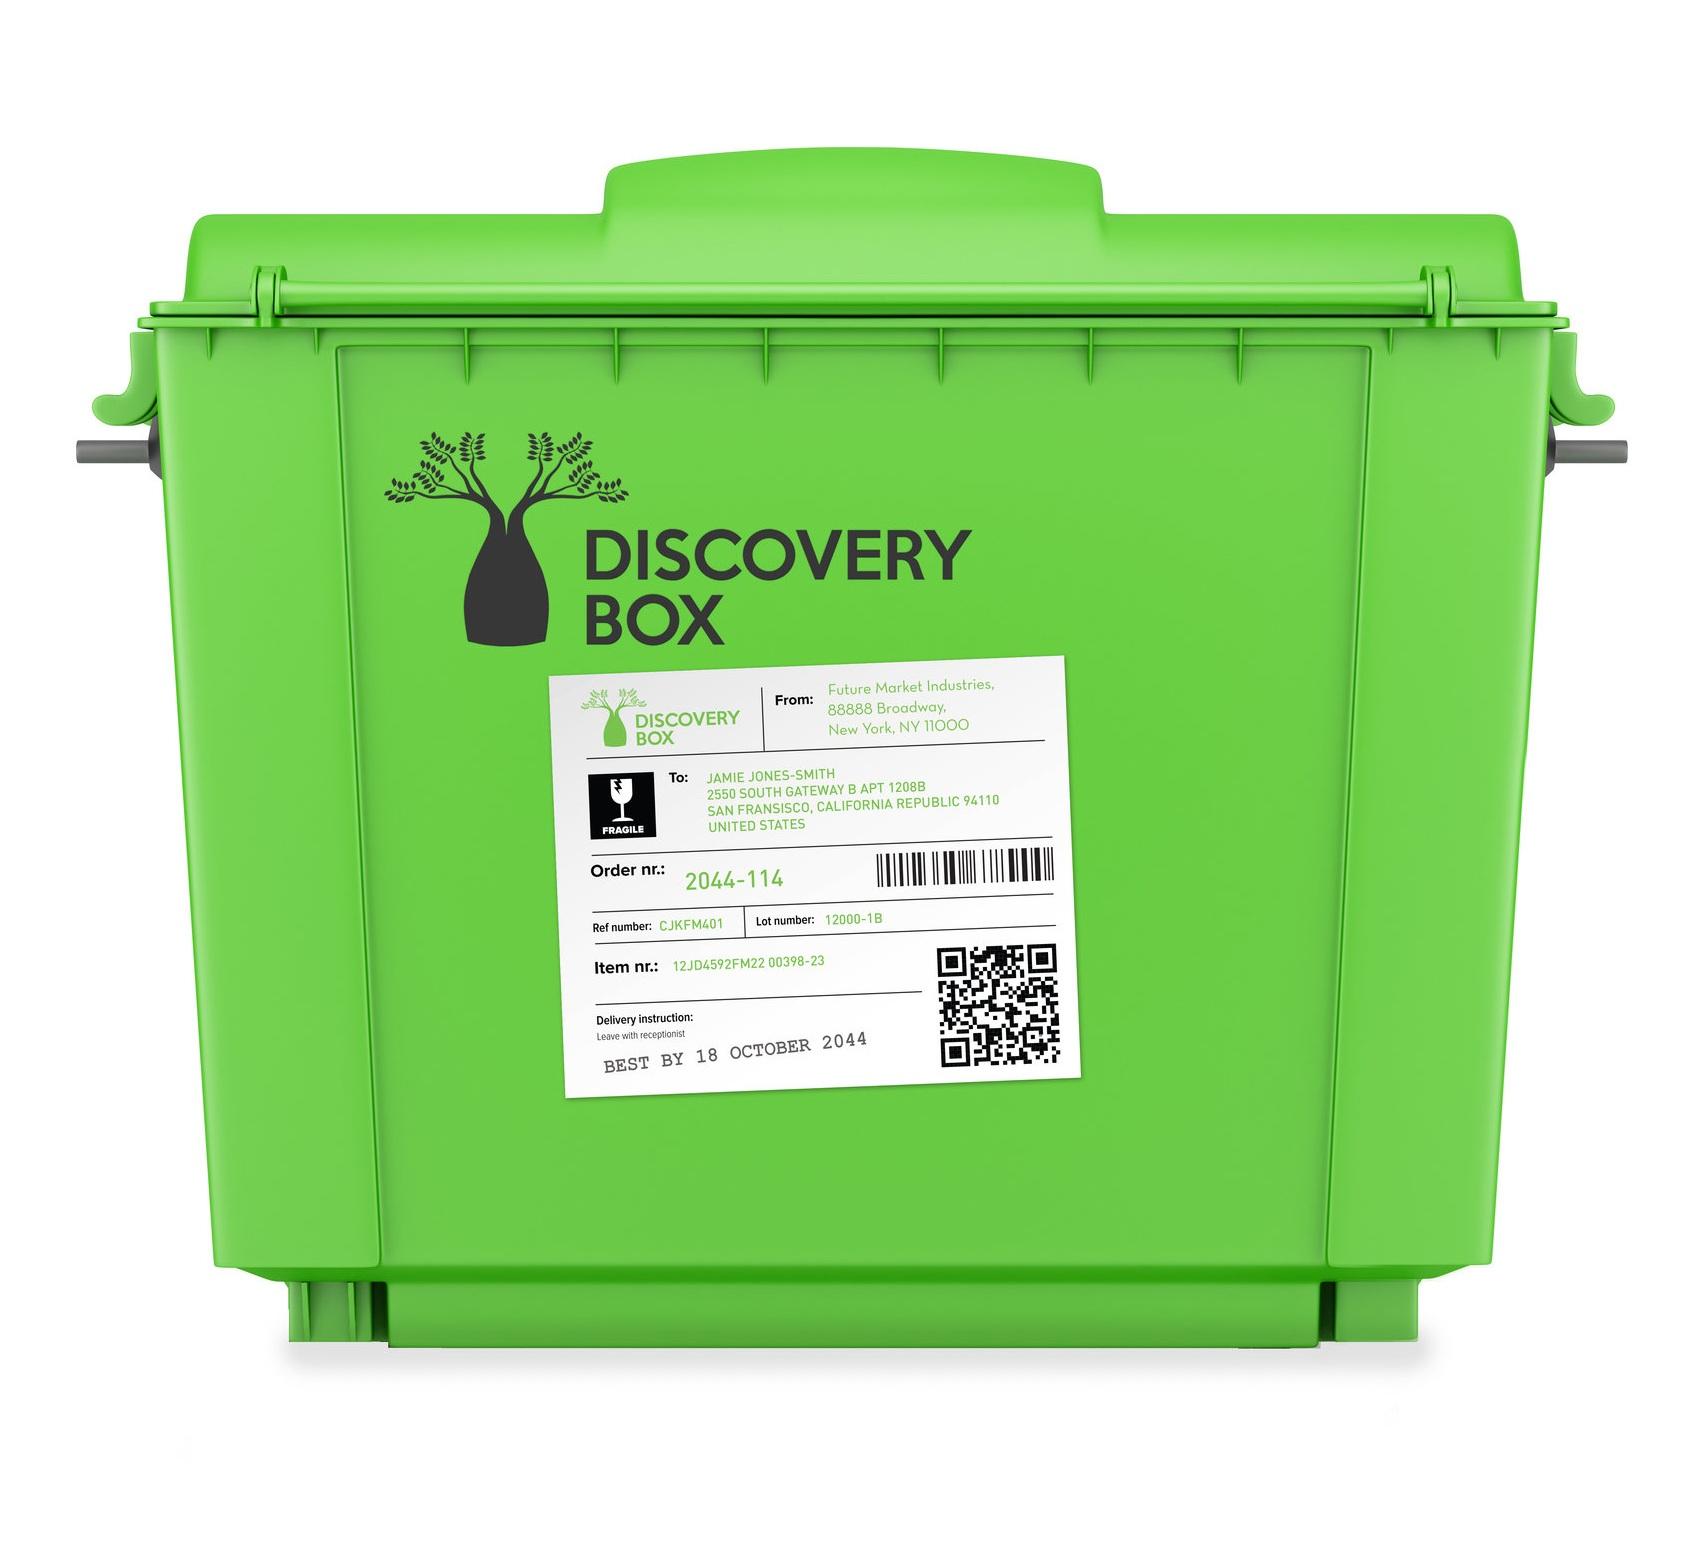 DiscoveryBox-back-final.jpg